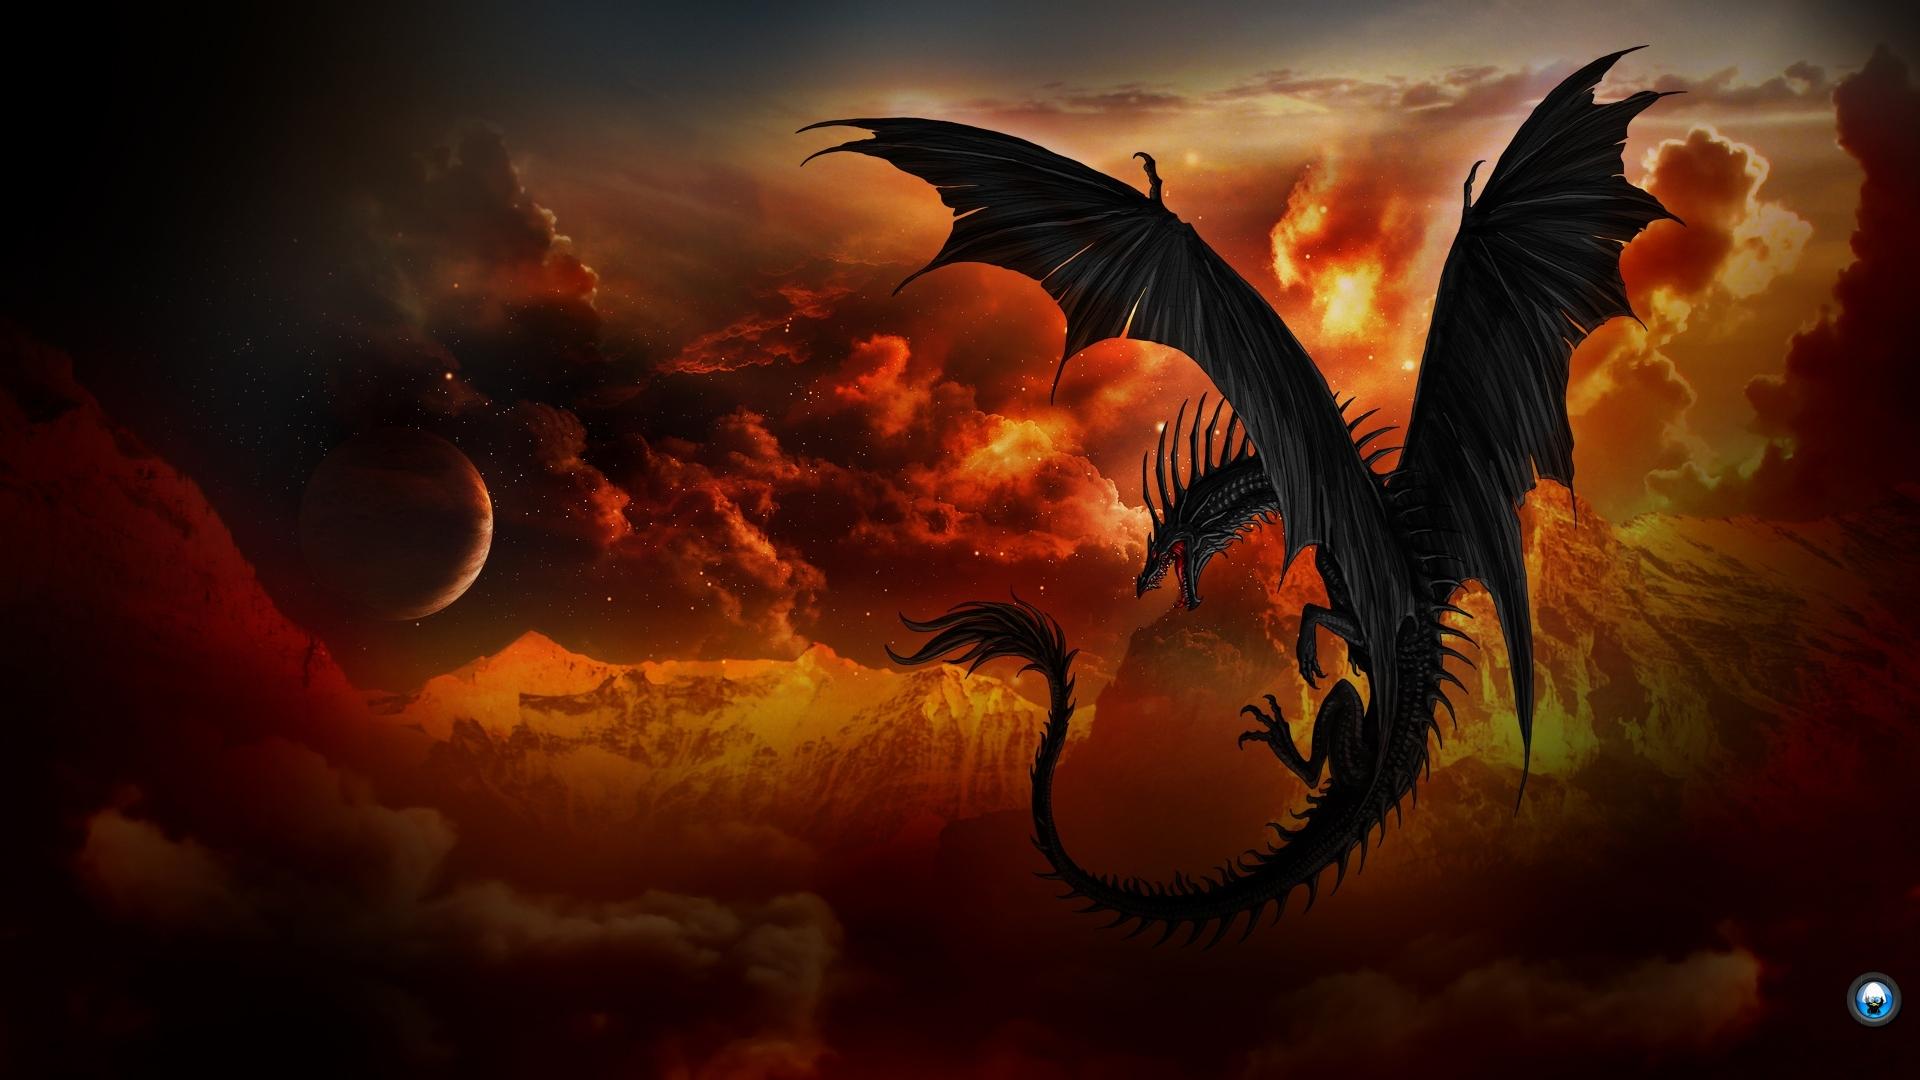 dragon full hd fond d'écran and arrière-plan | 1920x1080 | id:451186